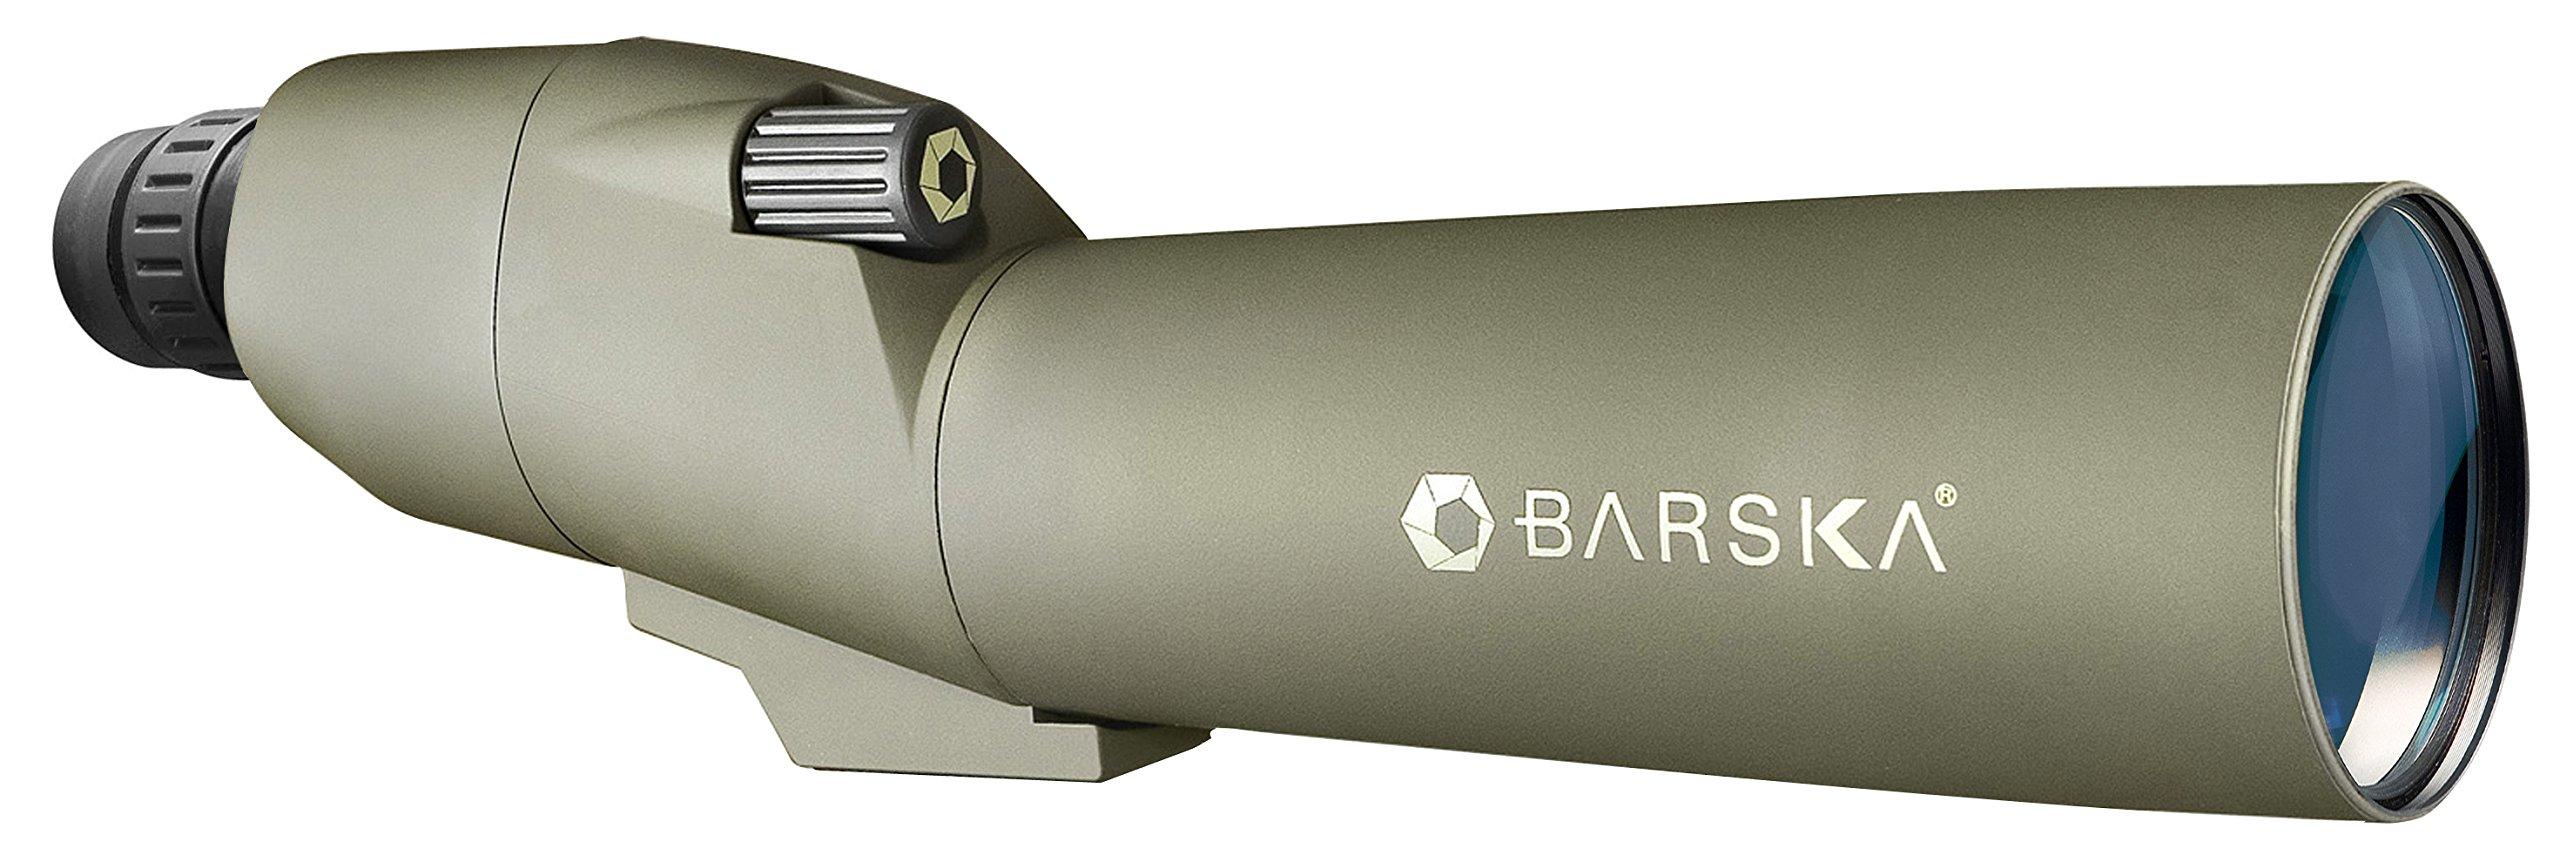 BARSKA Colorado Waterproof Spotting Scope by BARSKA